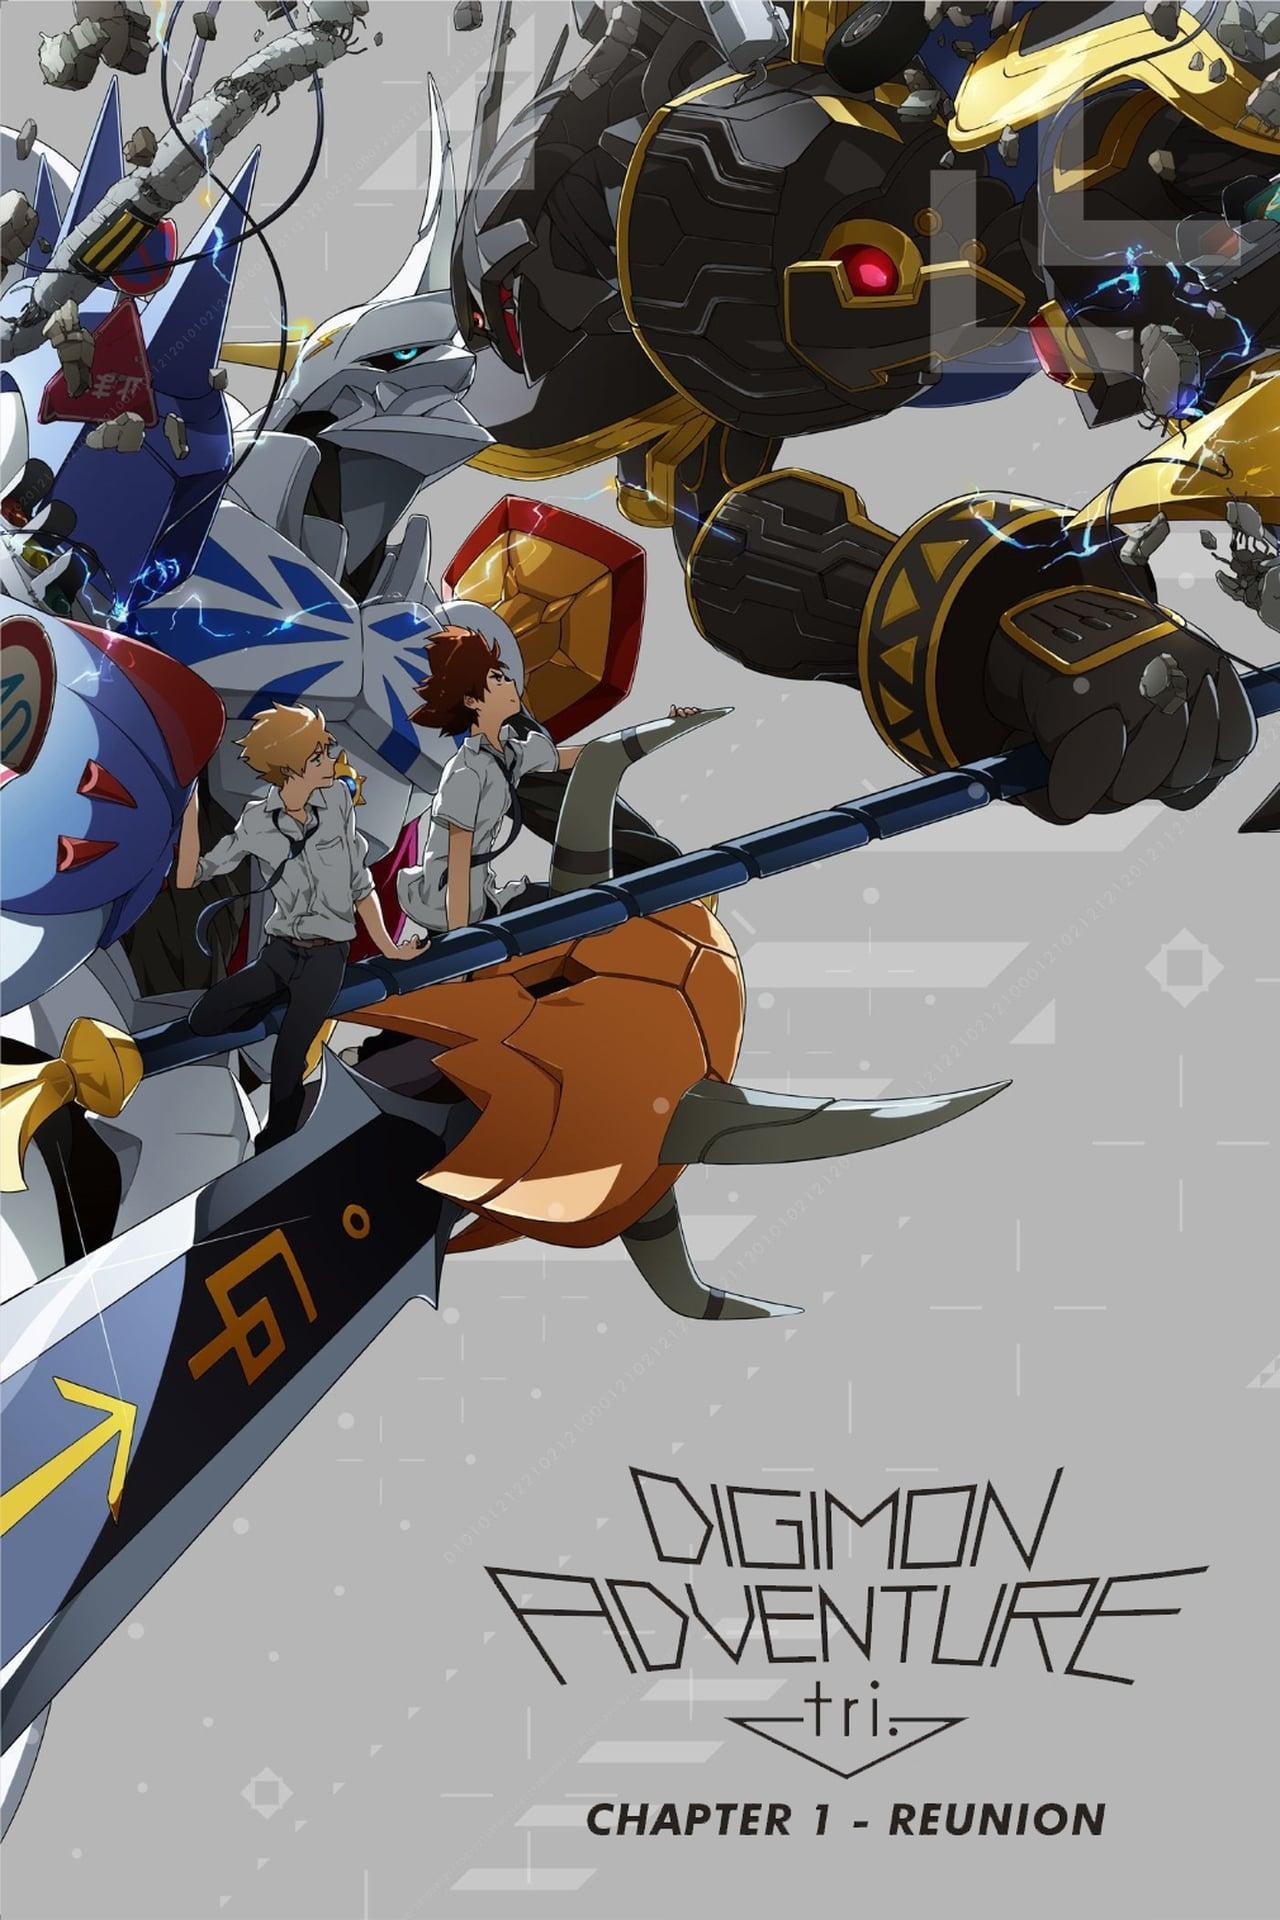 Digimon Adventure Tri. - Chapter 1: Reunion